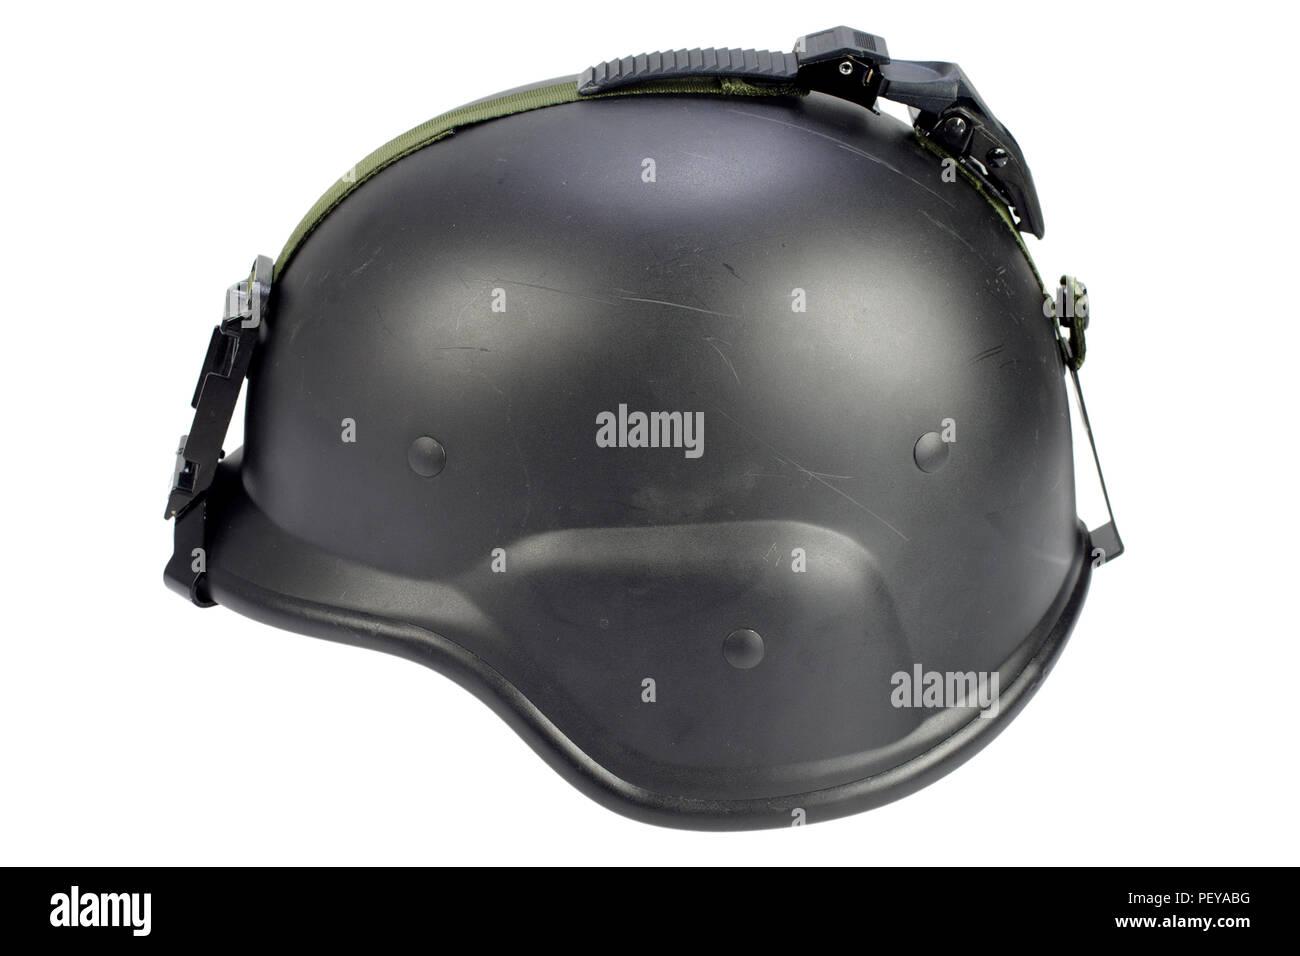 El ejército negro casco Kevlar aislado sobre fondo blanco Foto ... 0f43472d942